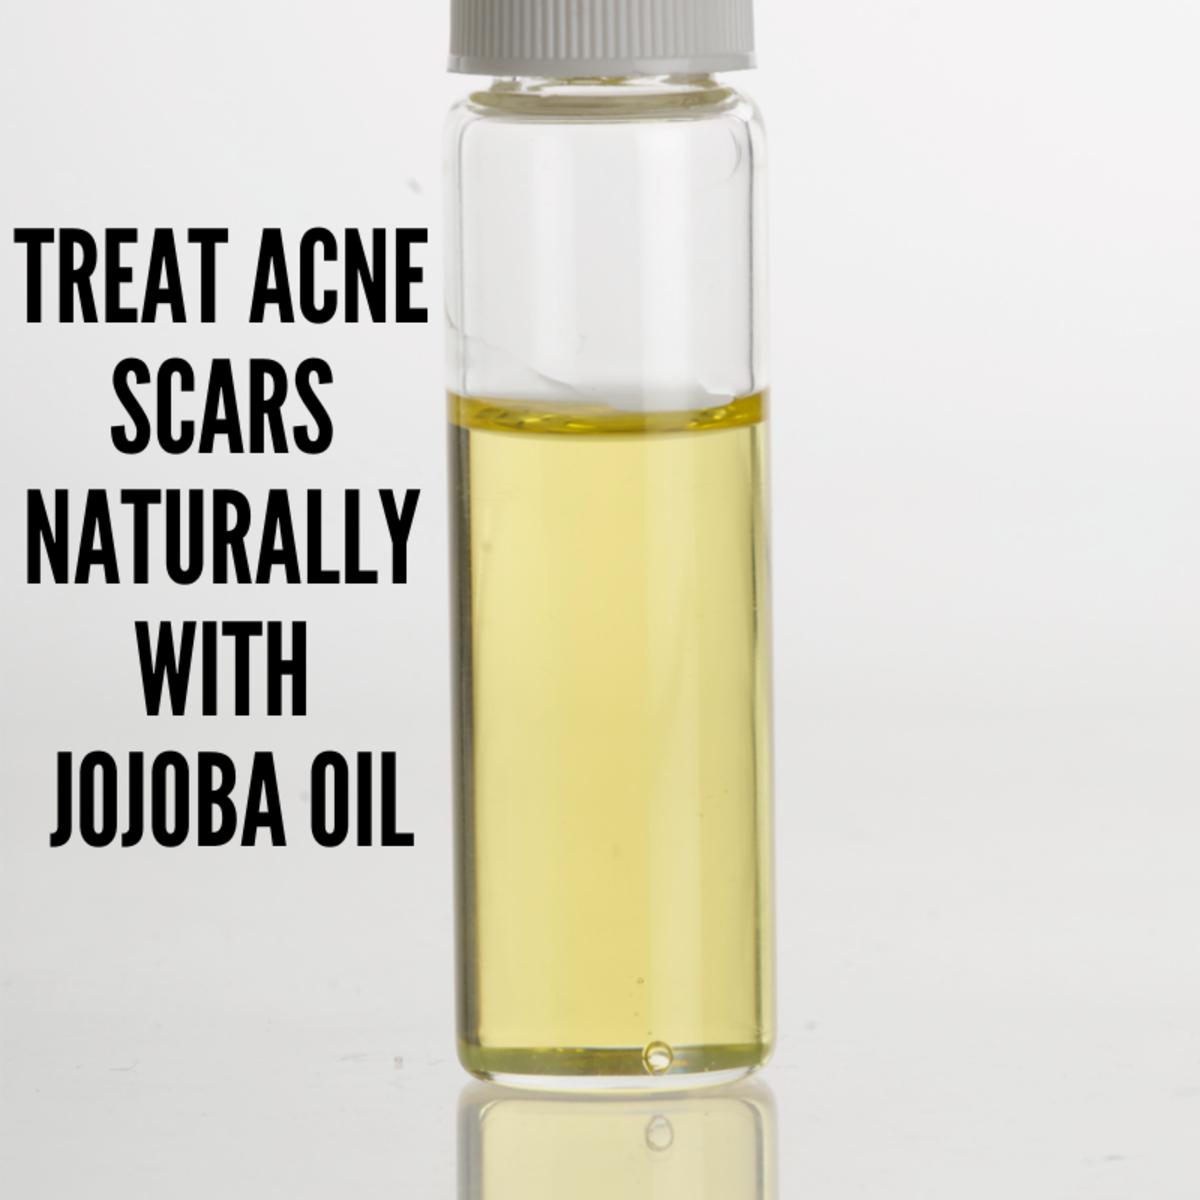 Glass vial containing jojoba oil.